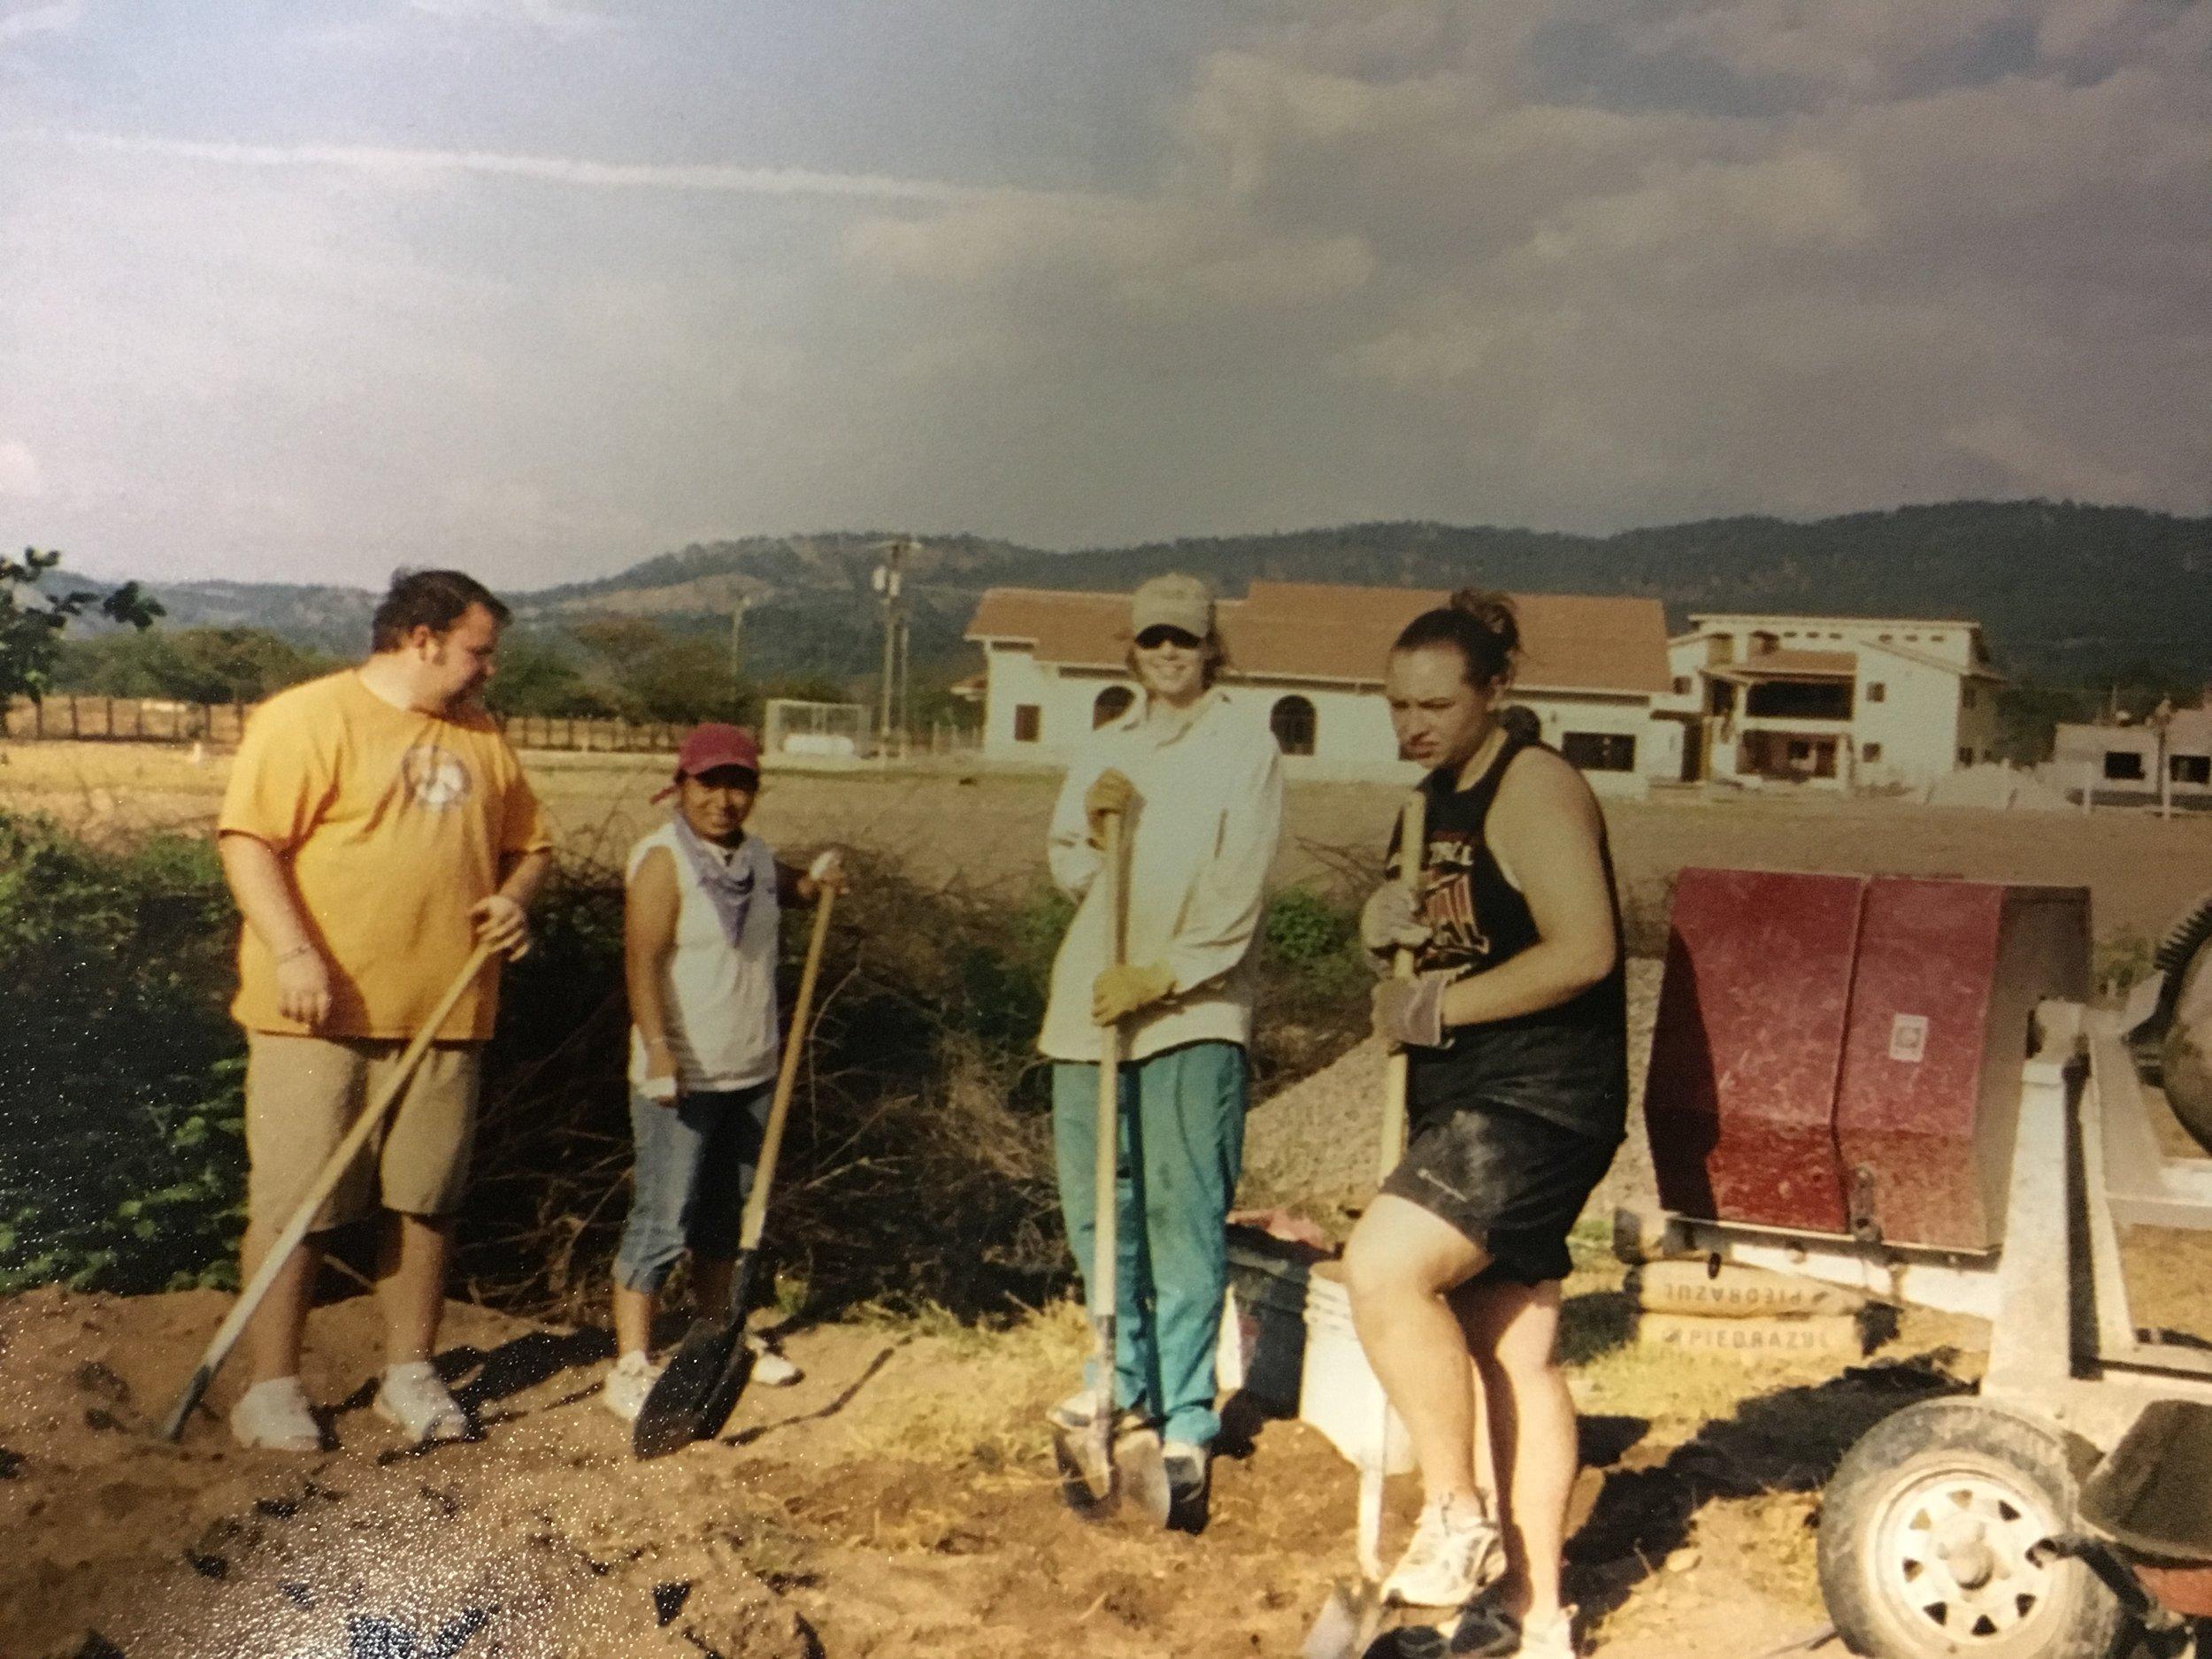 Bartola, second from left, Dr. Barrie Kaiser, far right